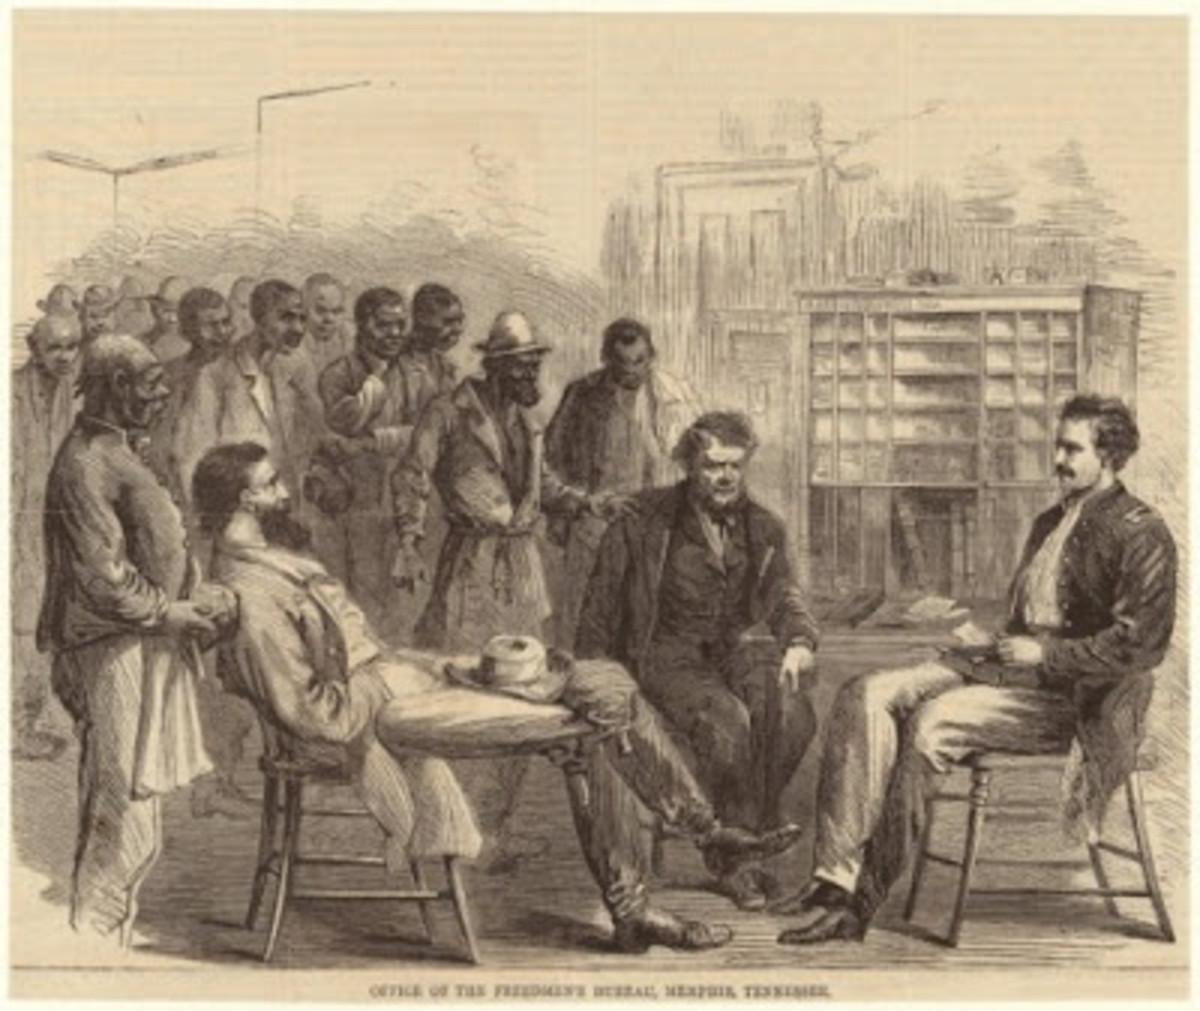 A History of the Freedman's Bureau